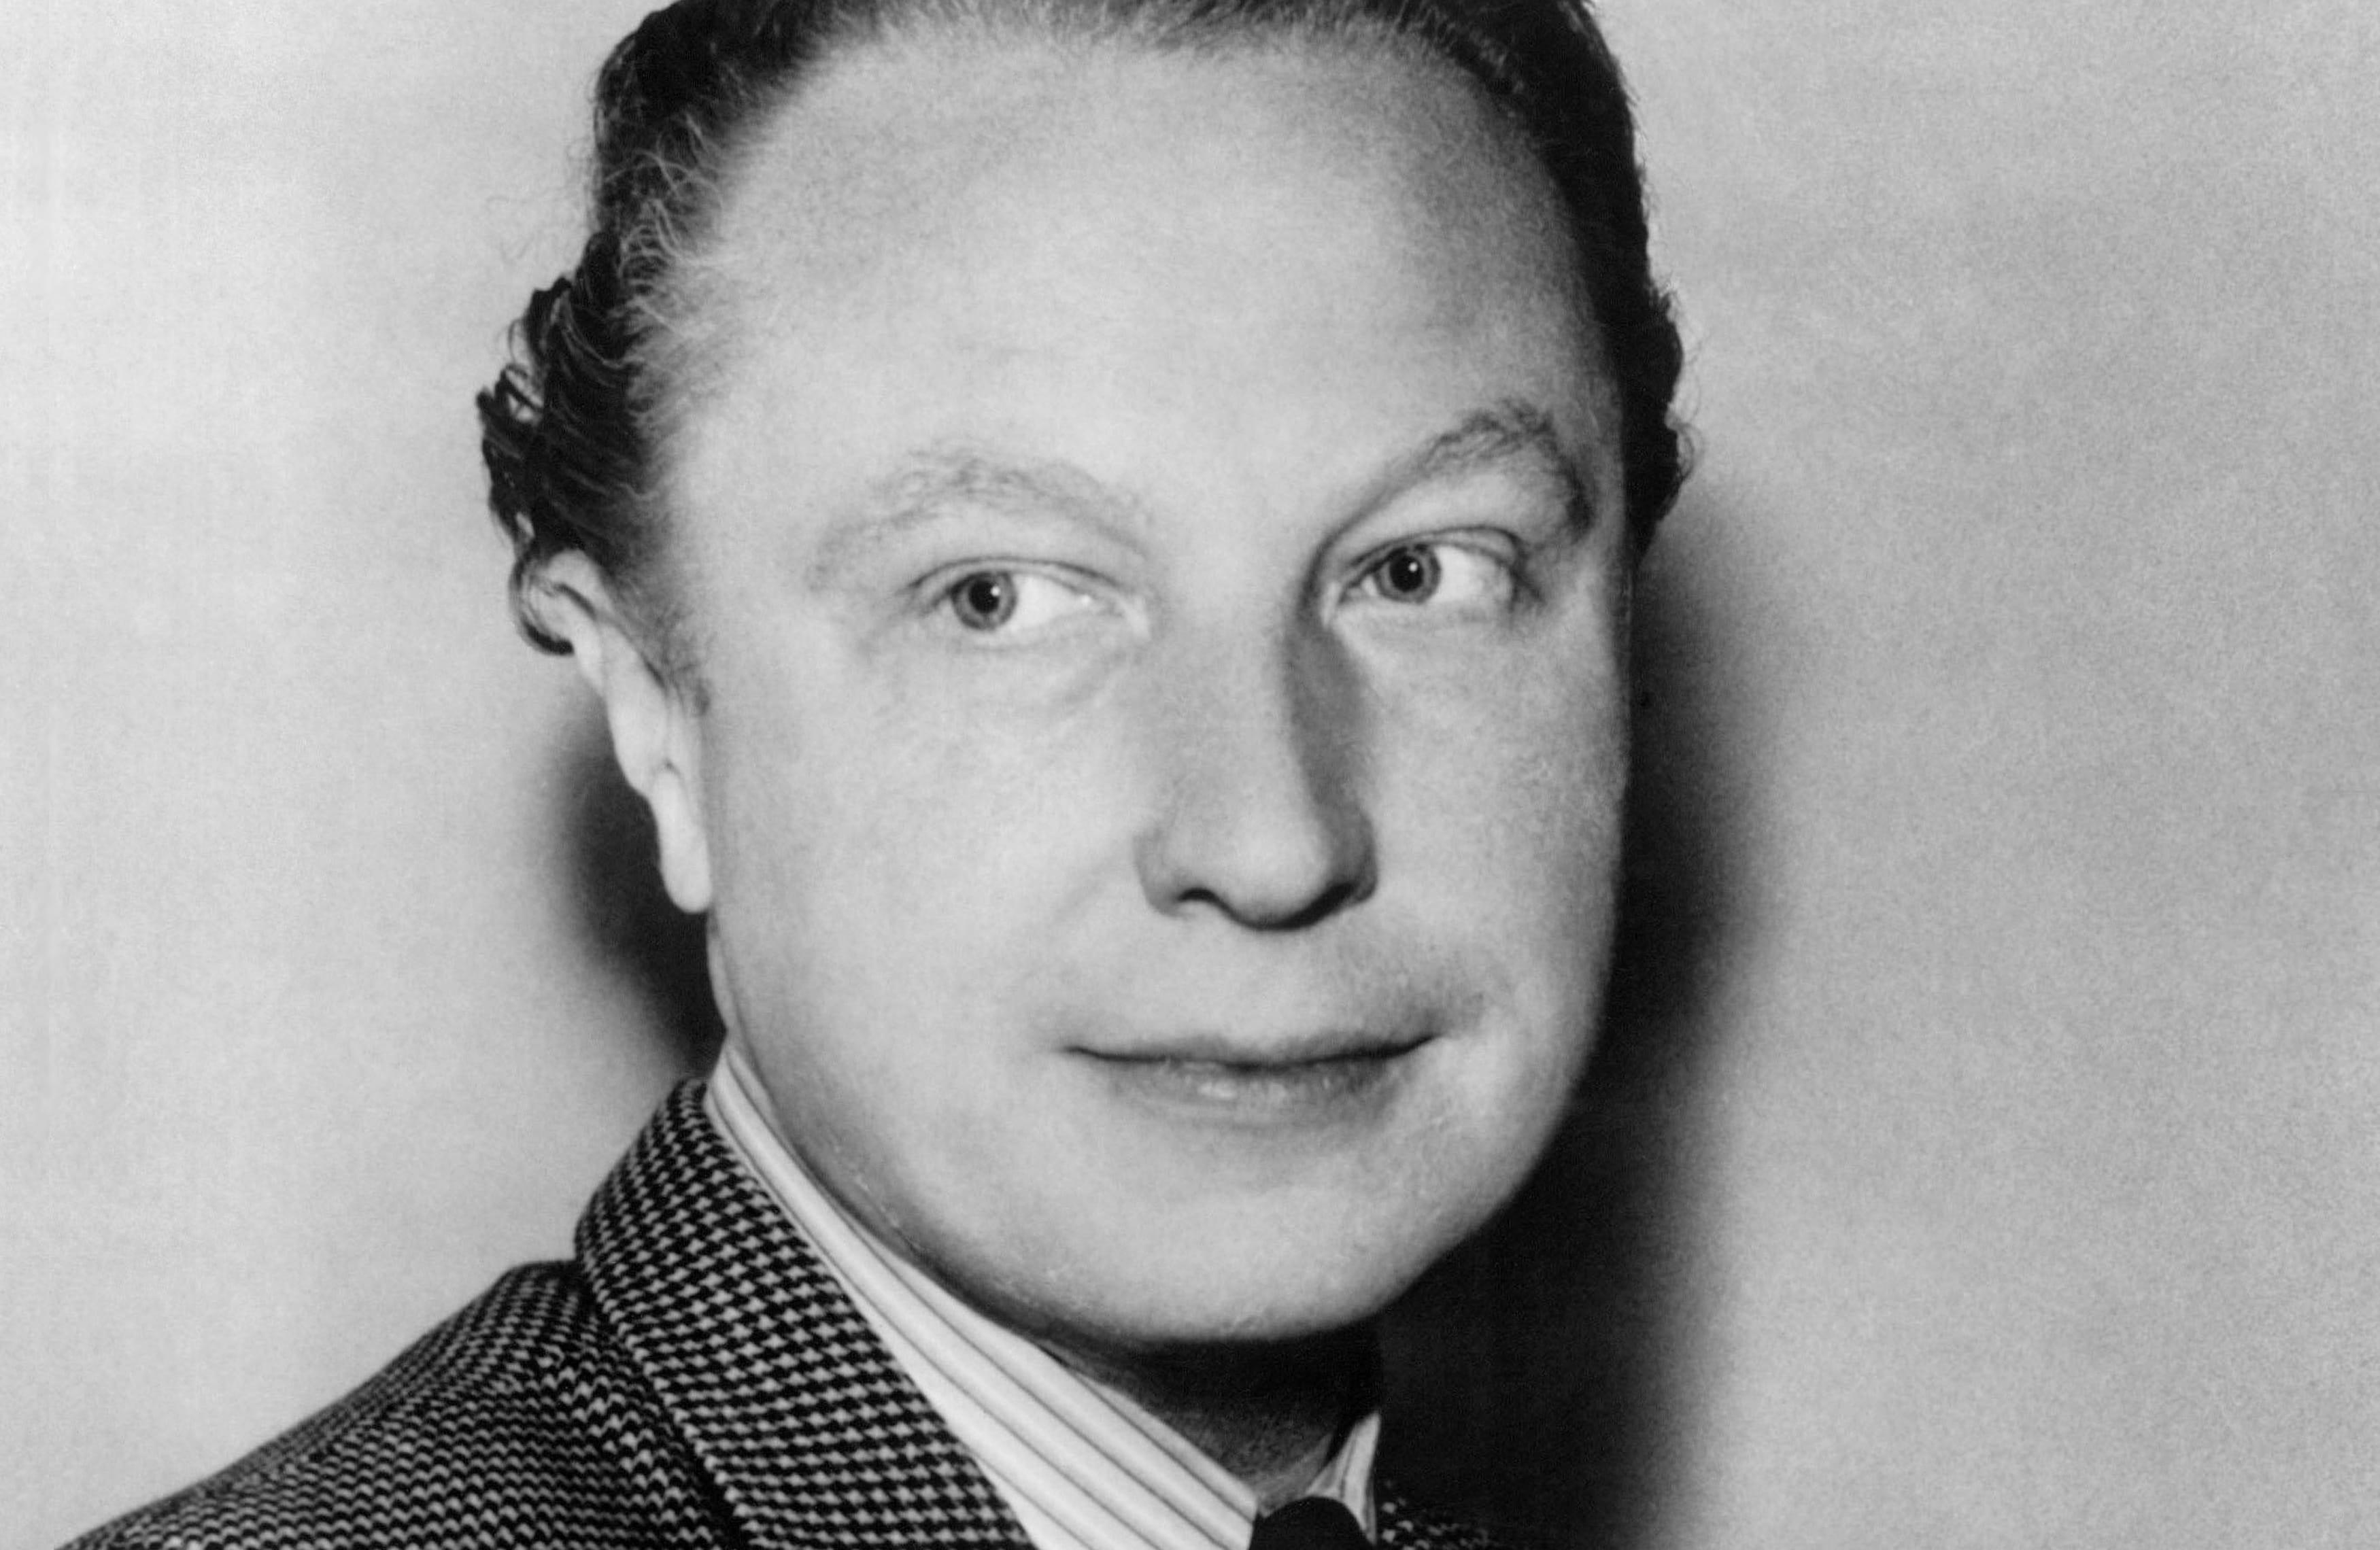 Douglas Sirk